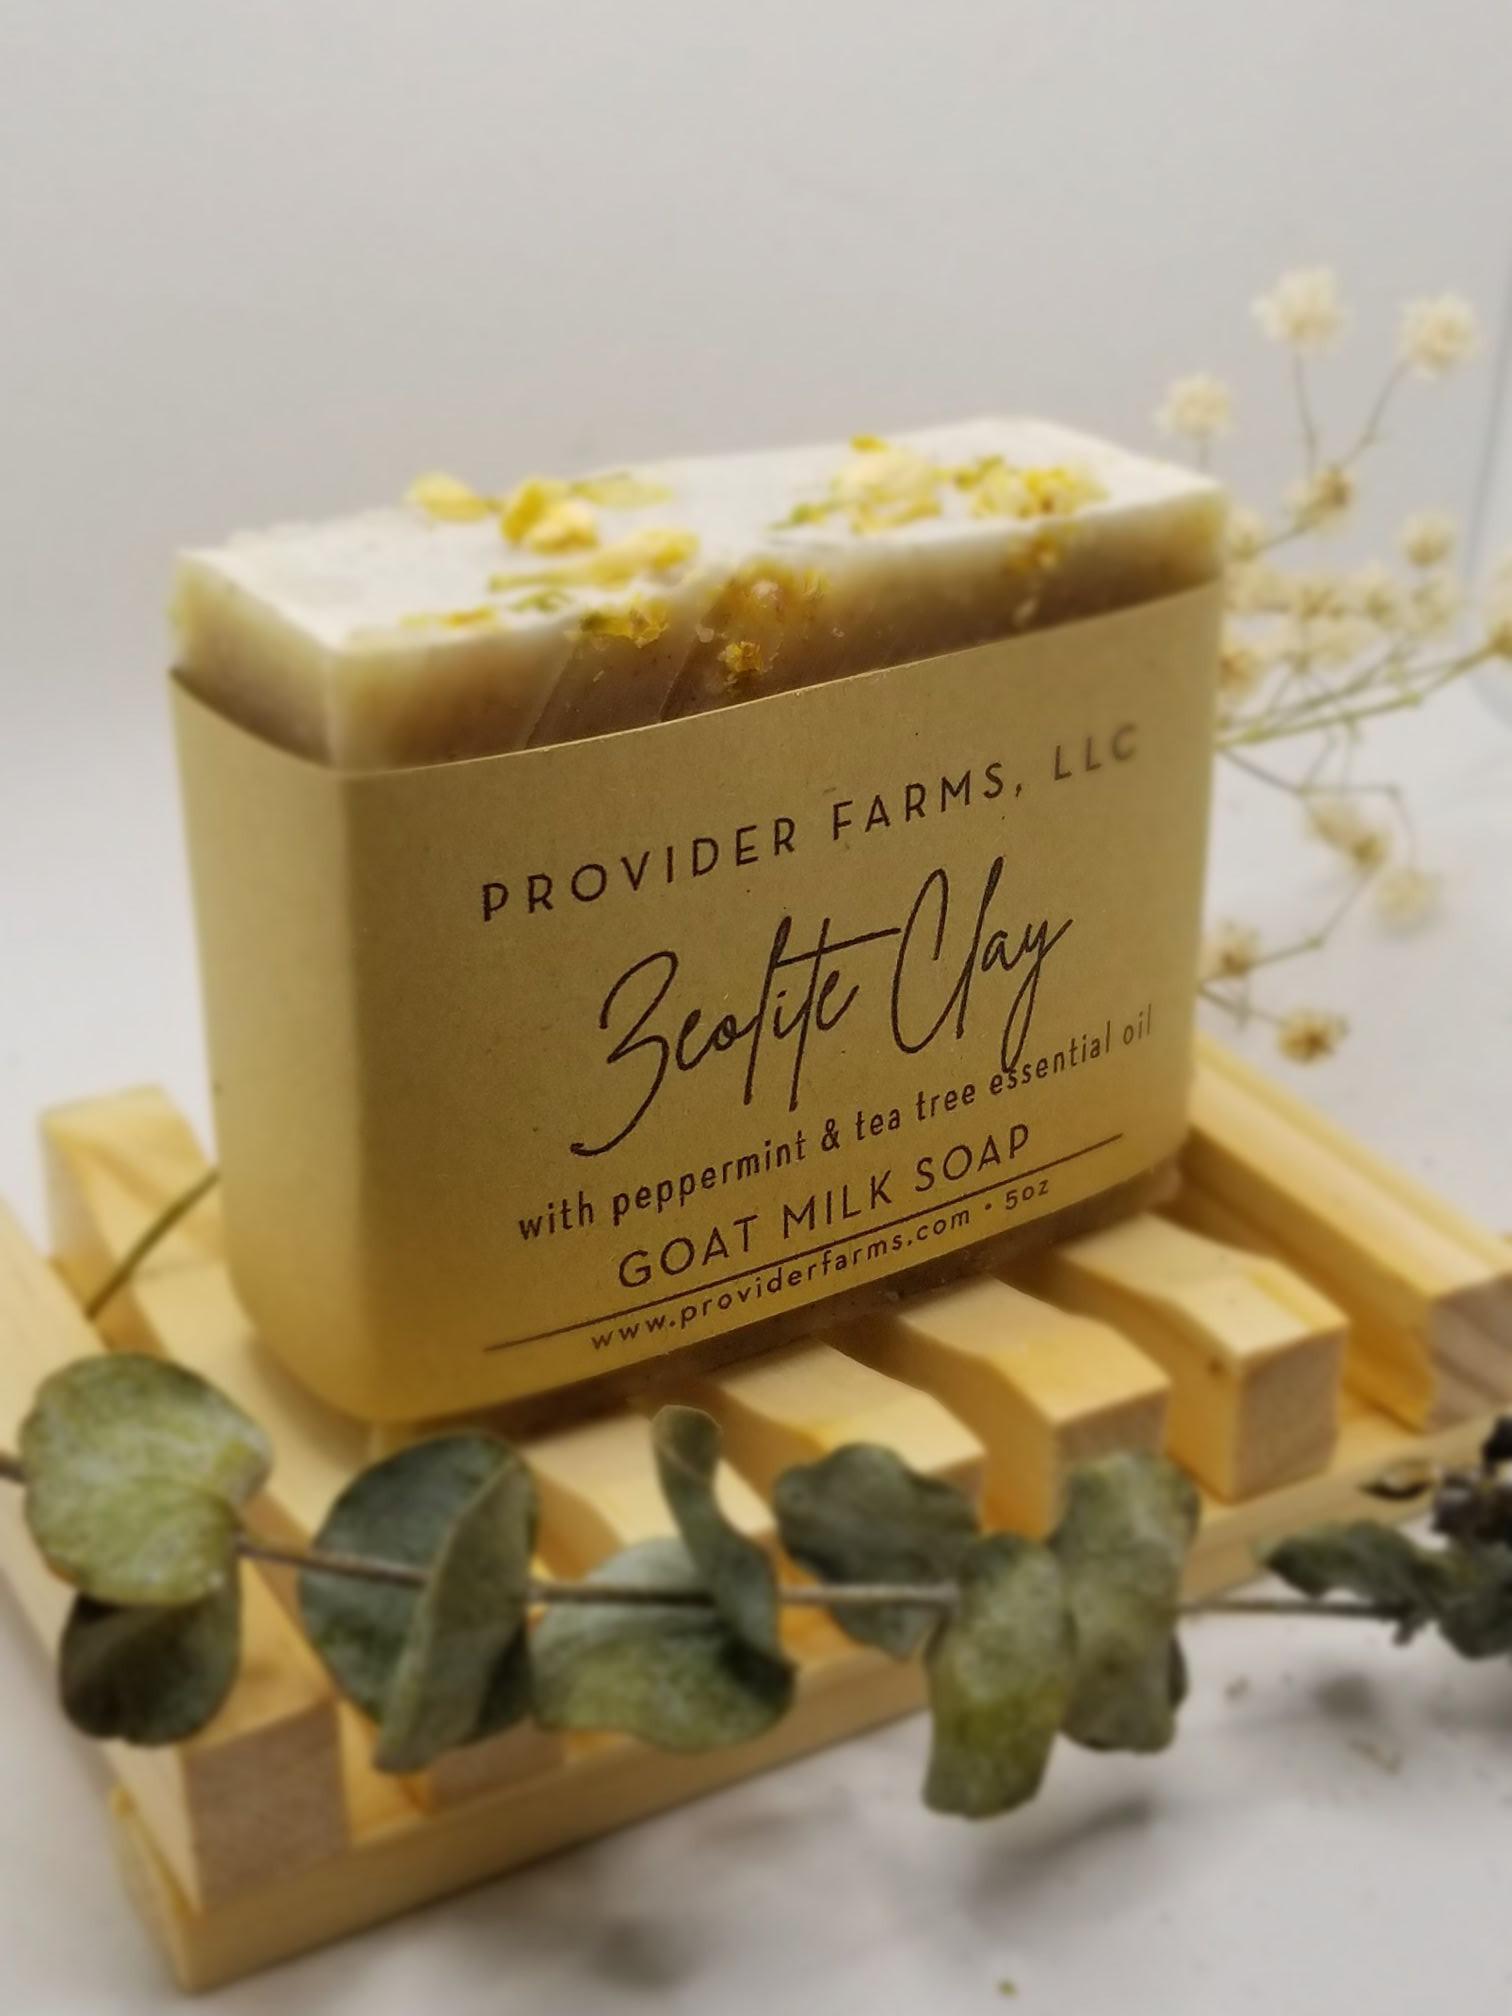 Goat Milk Soap (Zeolite Clay)